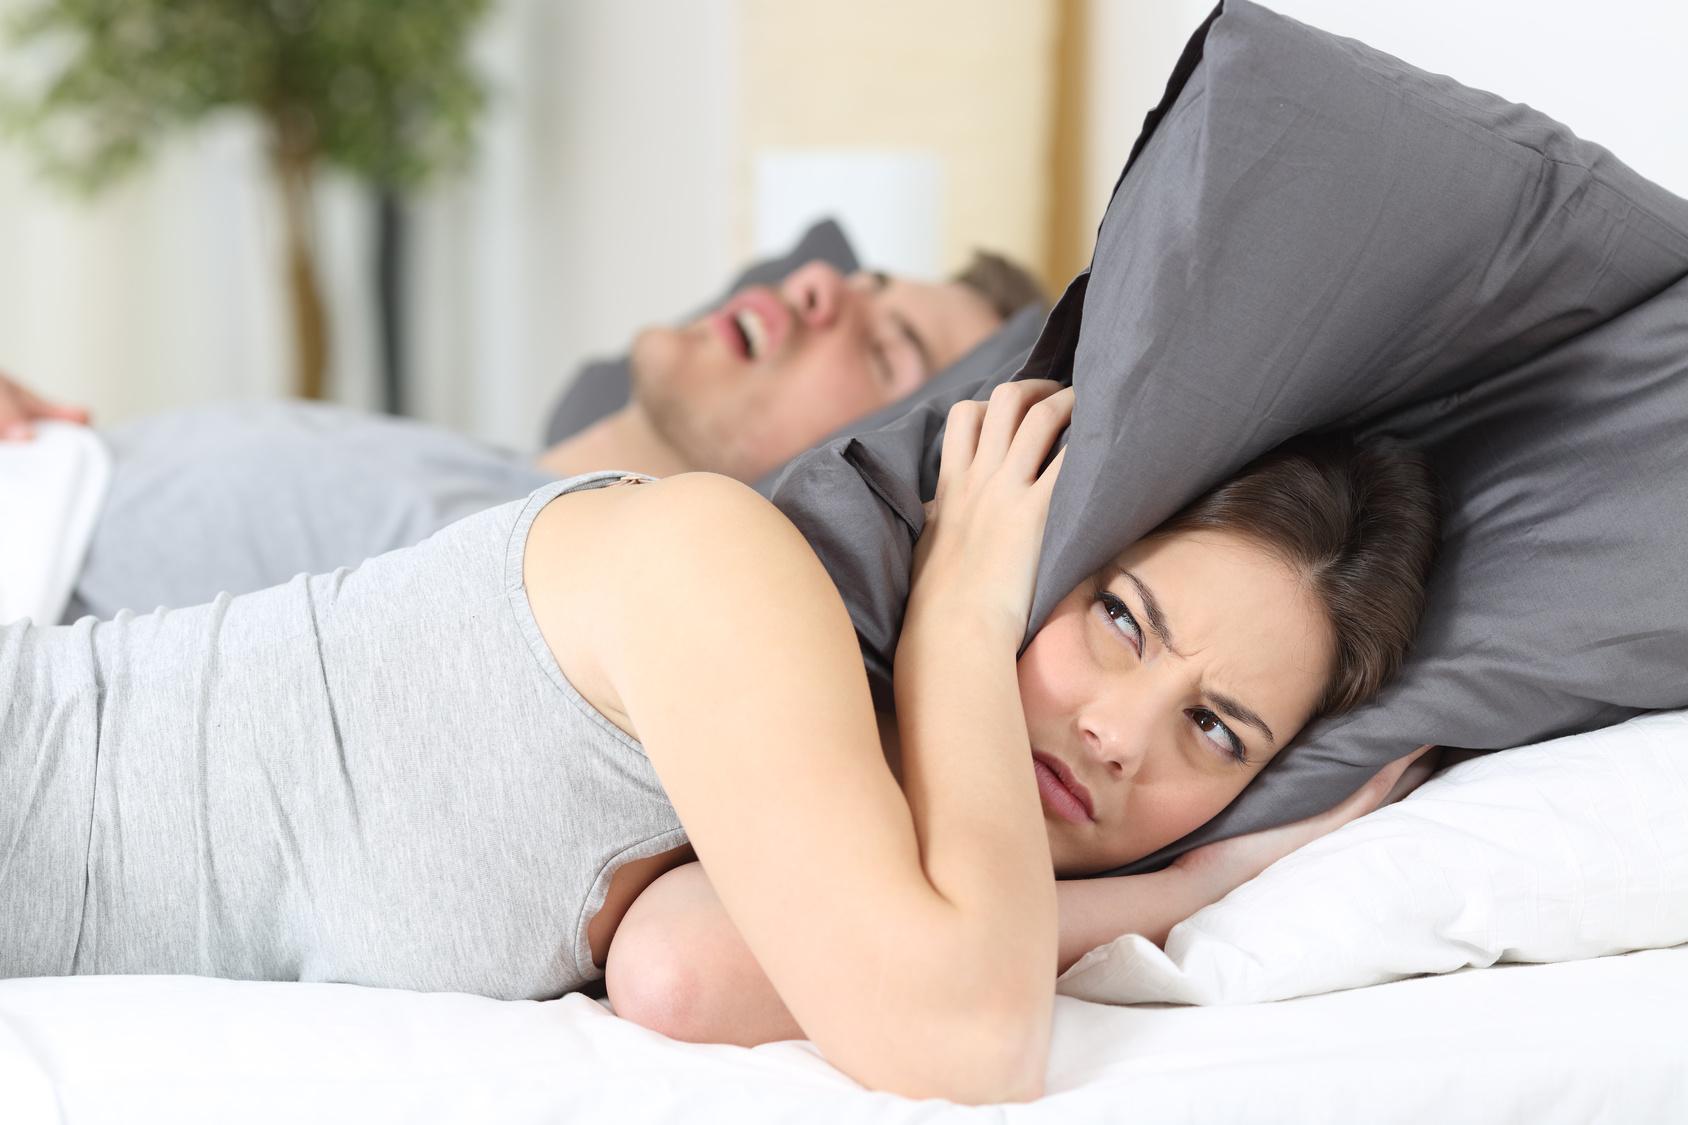 sonno disturbato da apnee notturne